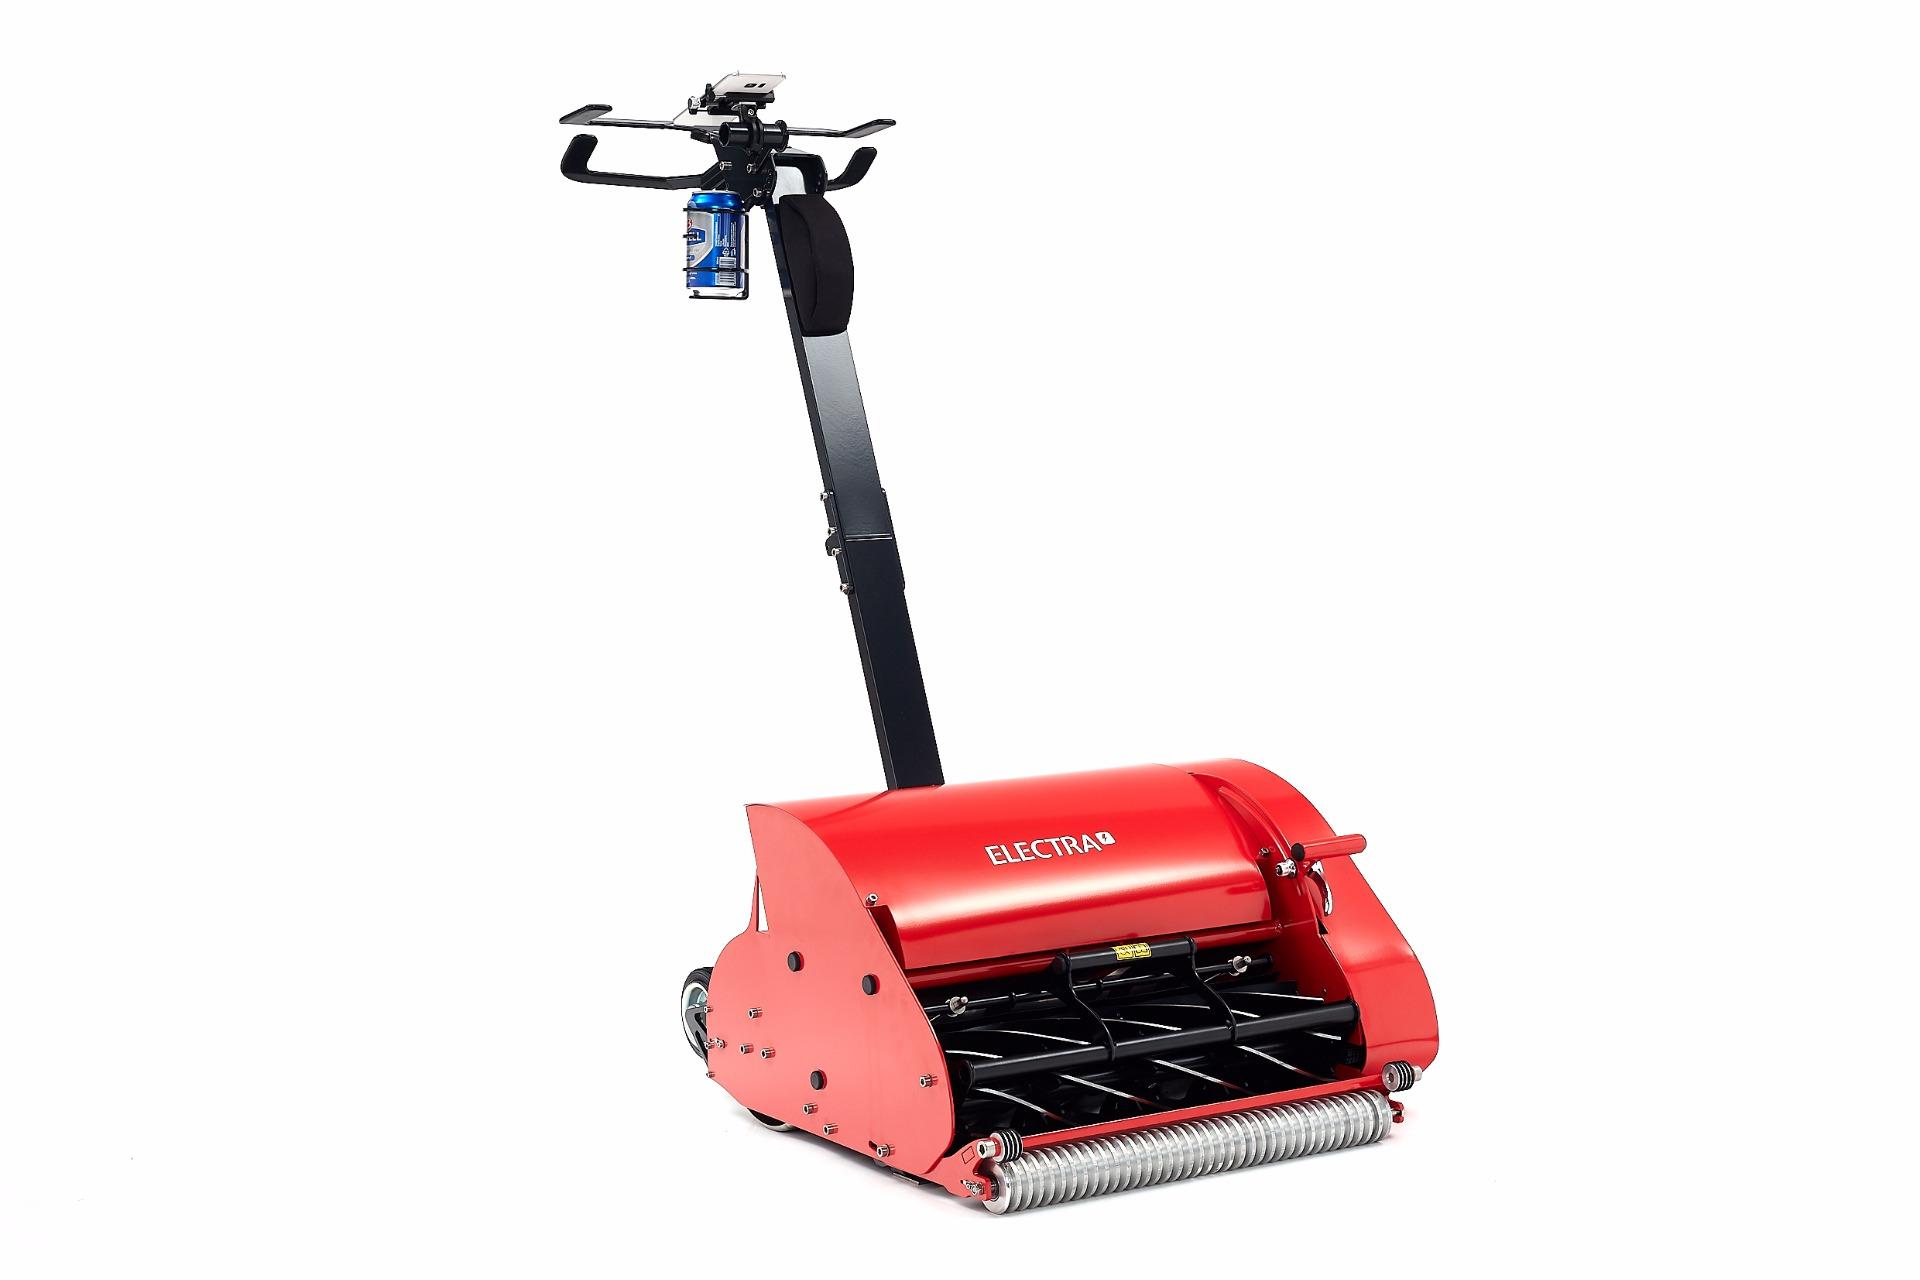 electric cordless model Electra lawn mower